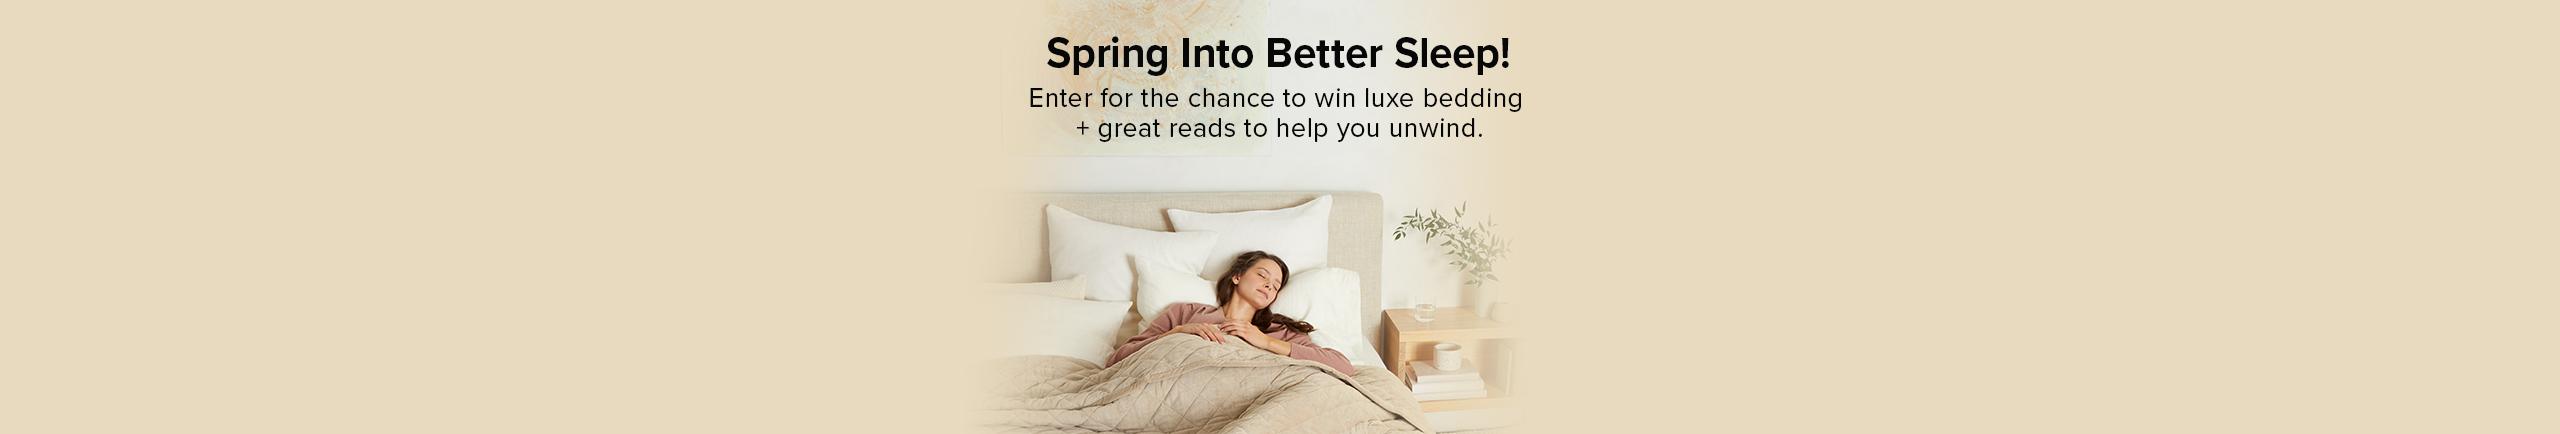 Spring into Better Sleep